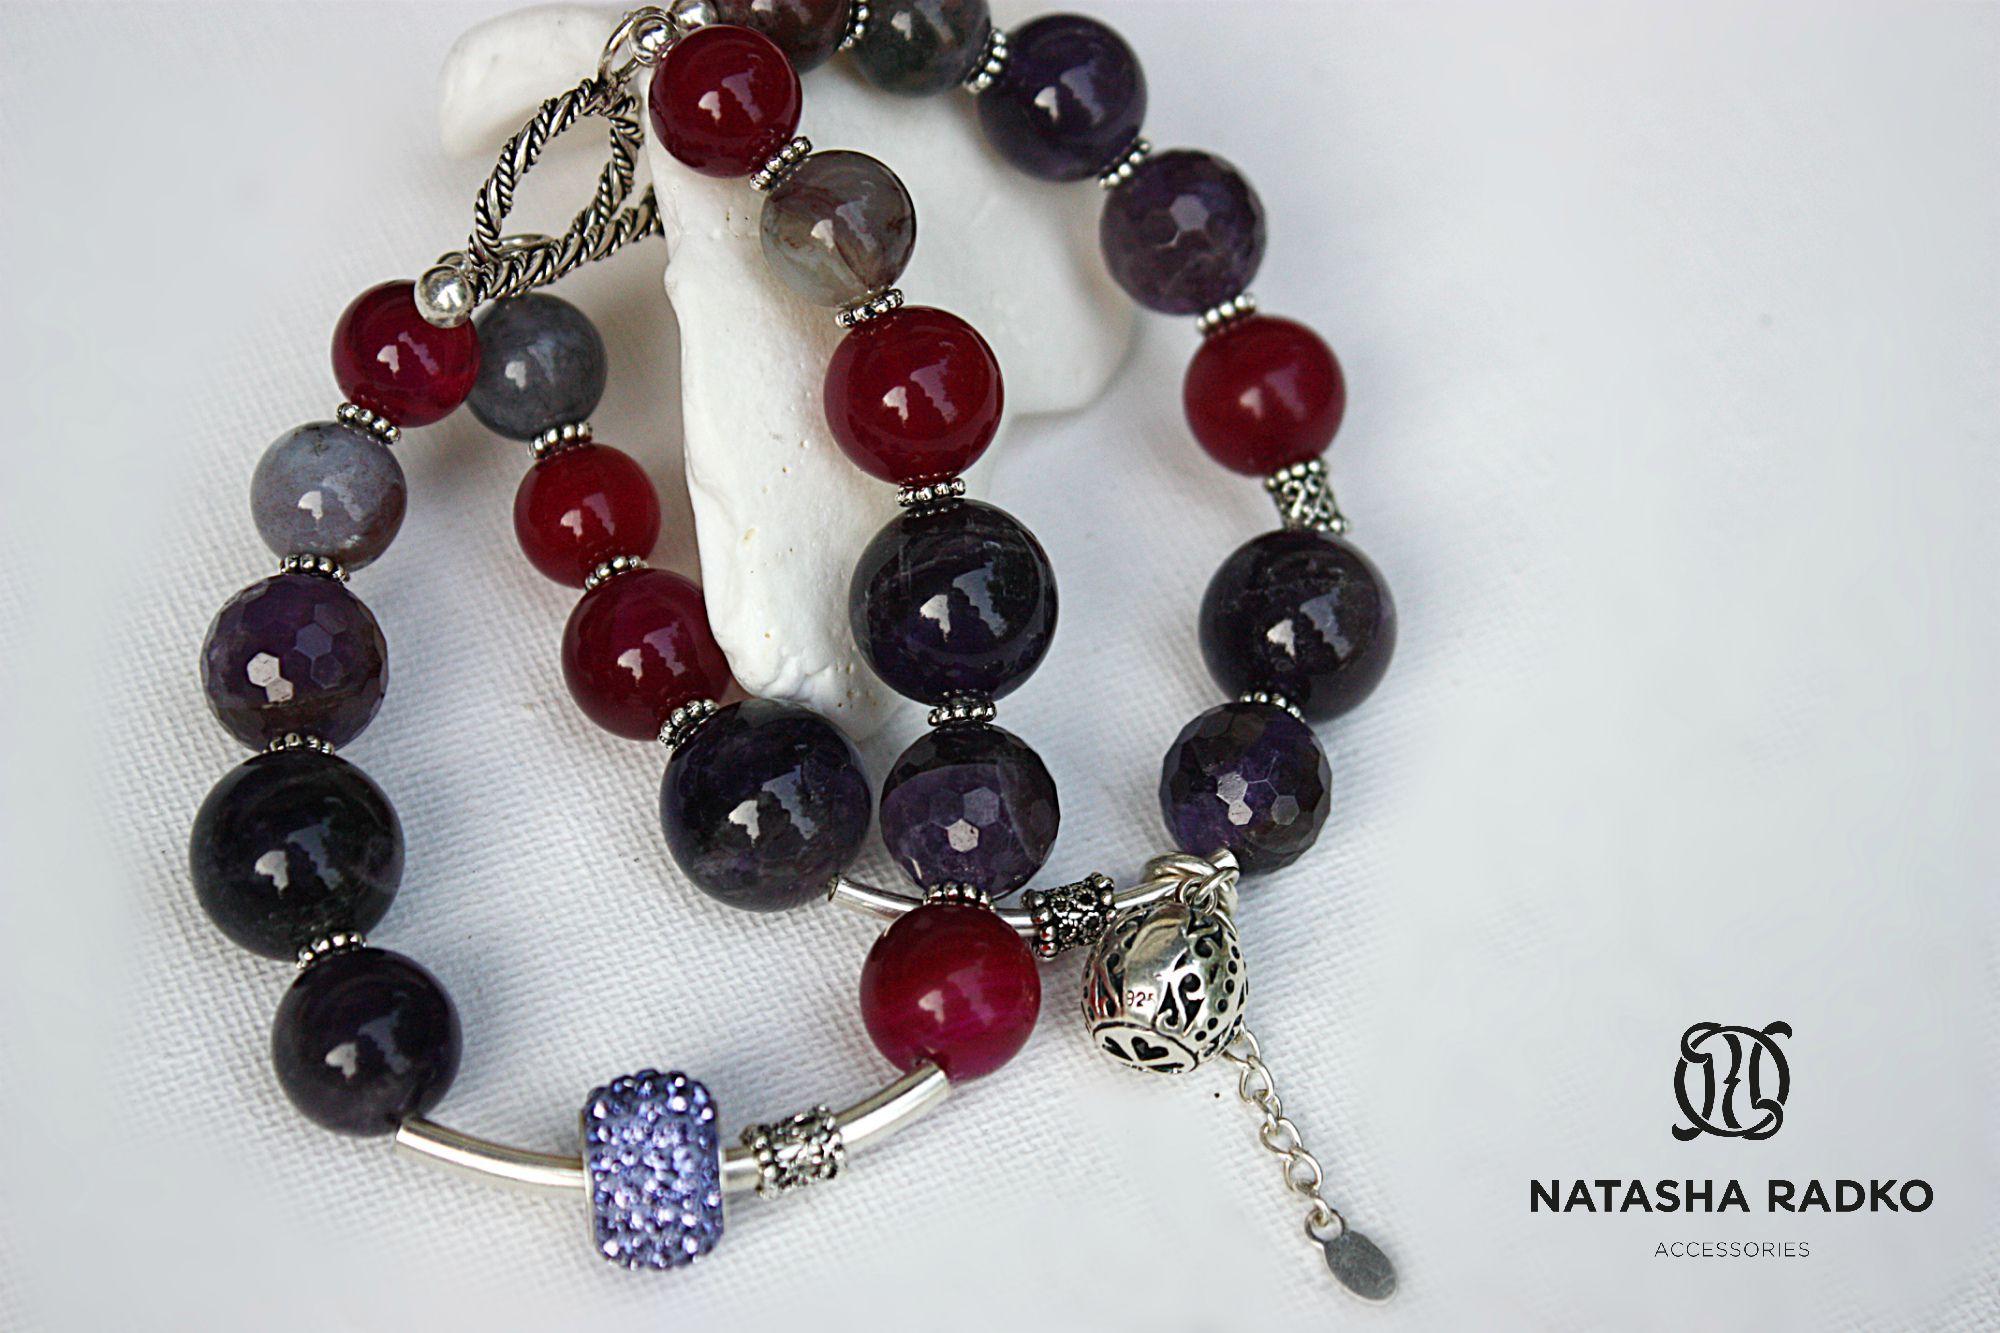 wristlet present silver agate amethyst jewelry